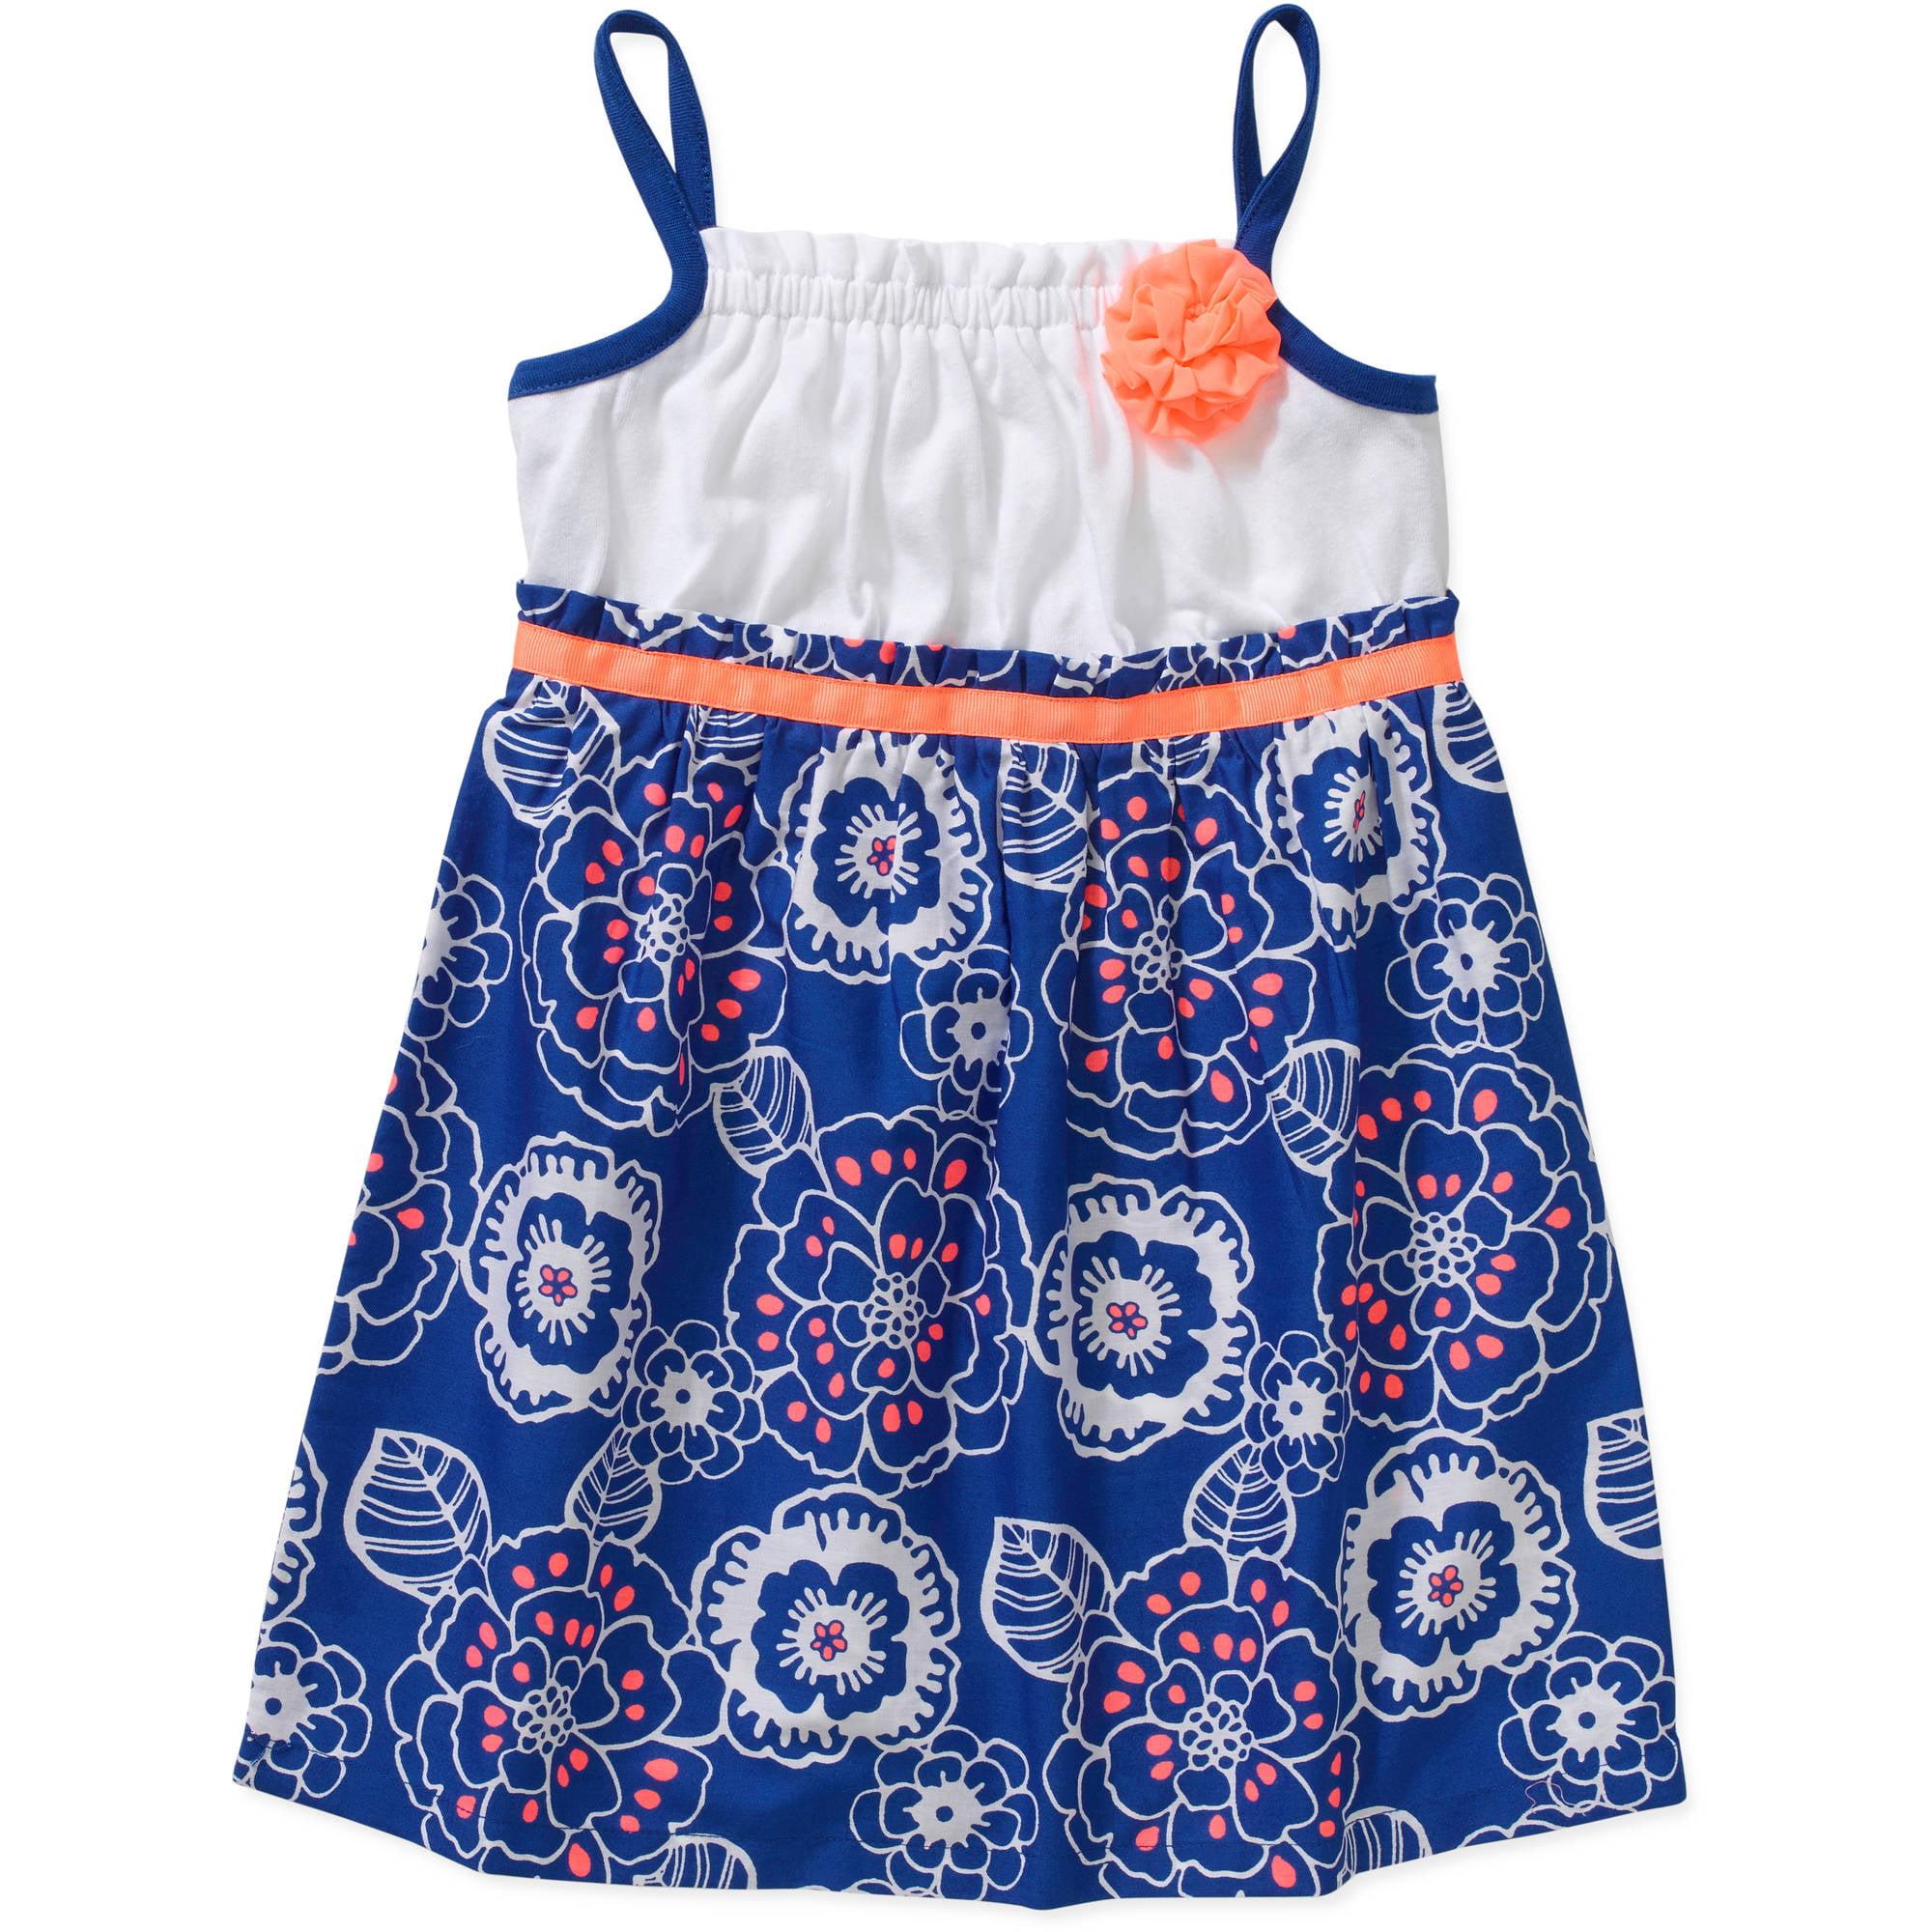 Baby Toddler Girl Essential Summer Knit & Woven Rosette Dress